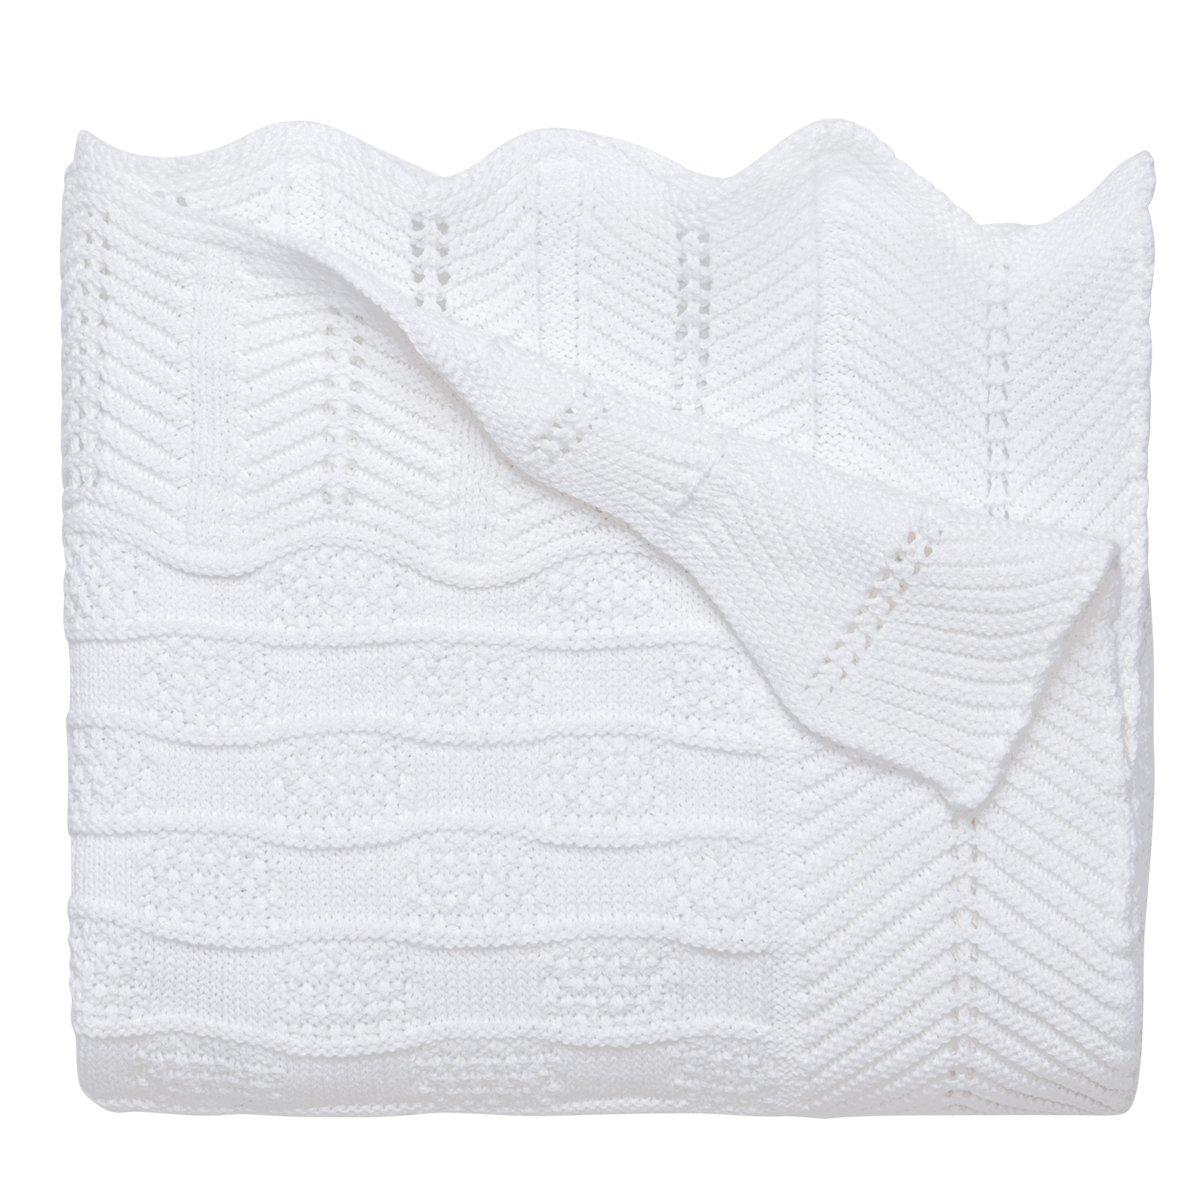 "Elegant Baby Premium 100% Cotton Knit Blanket, White Texture Knit, 30"" x 40"""